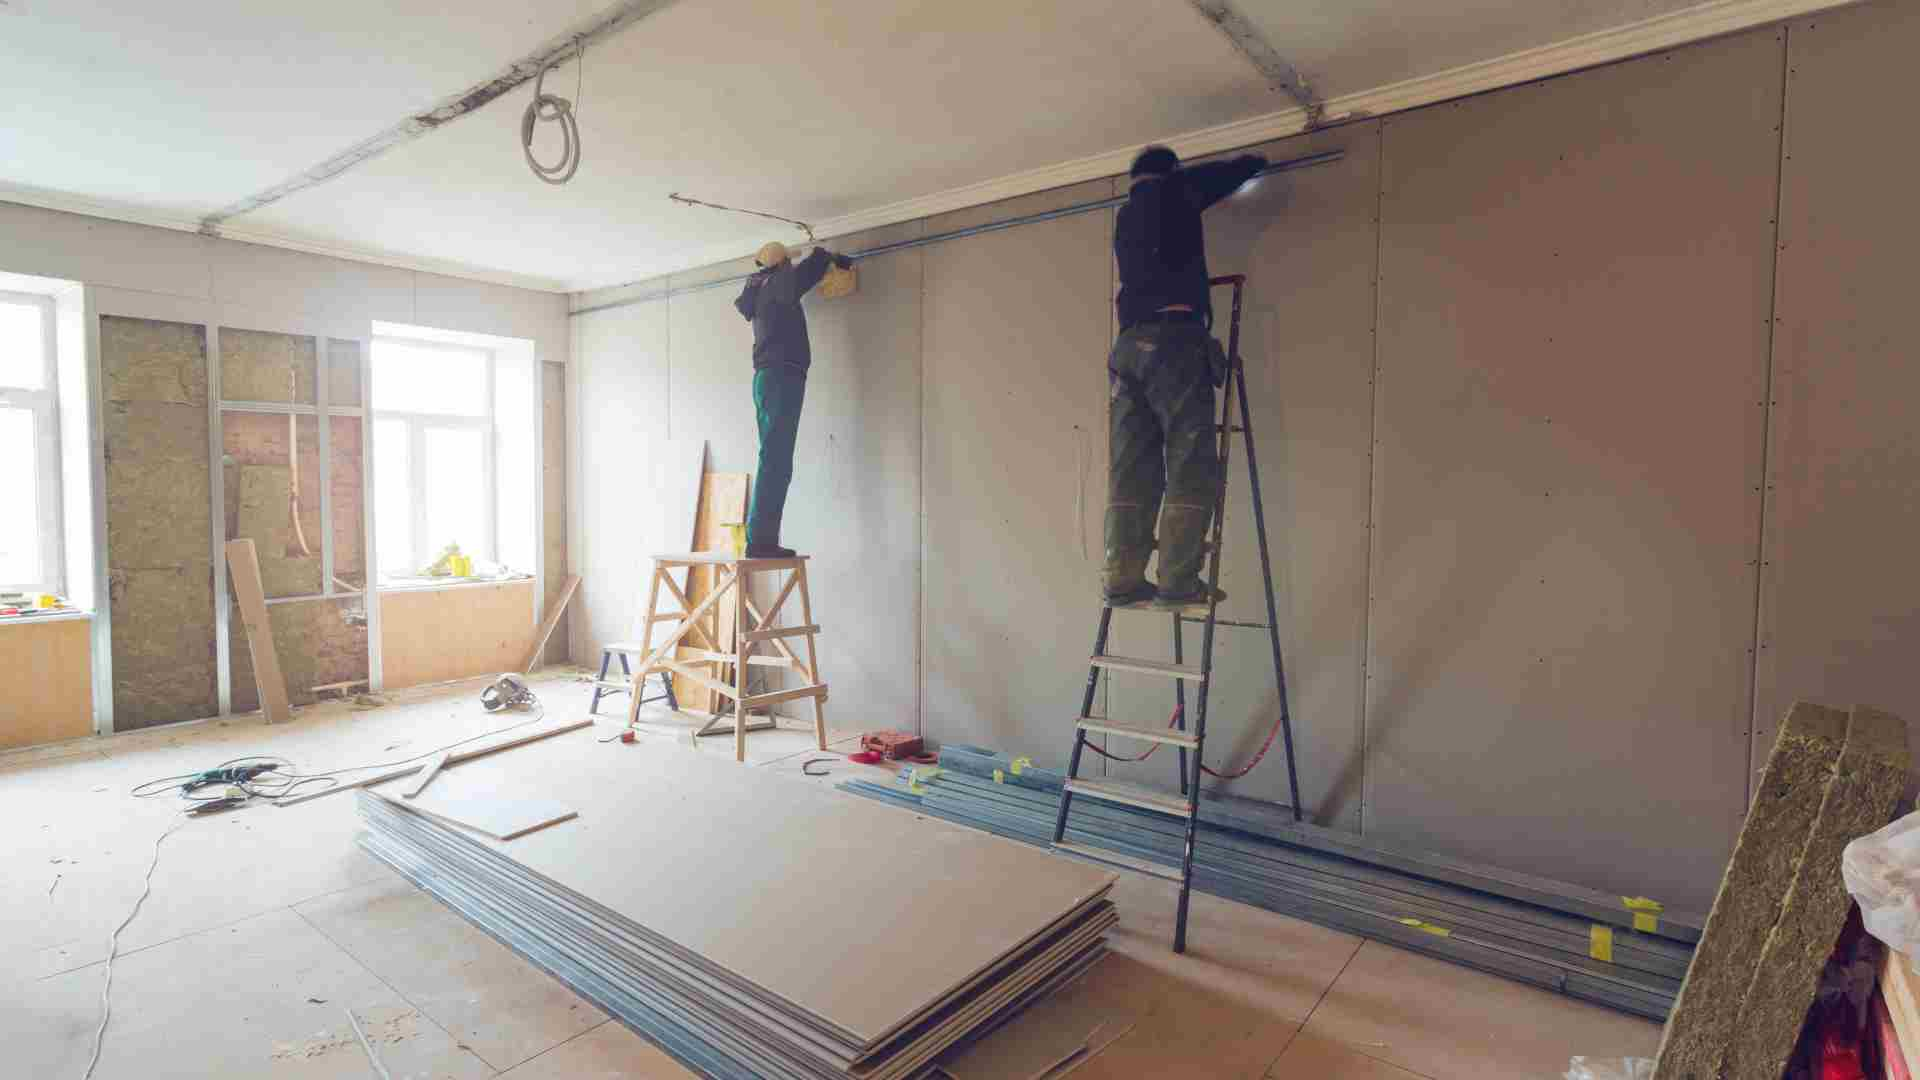 HomeBuilder having limited impact on renovations